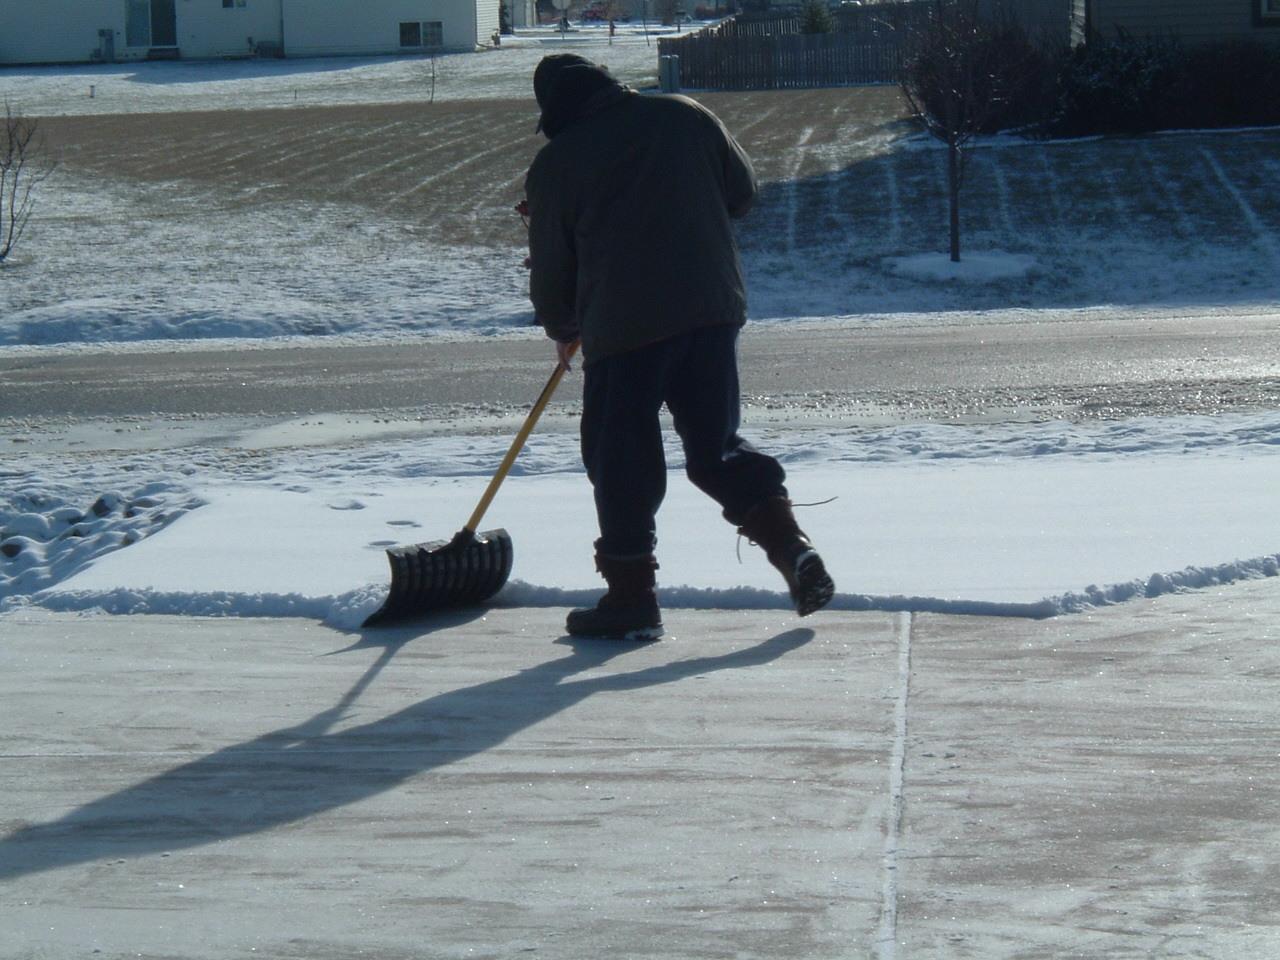 Man shoveling icy driveway